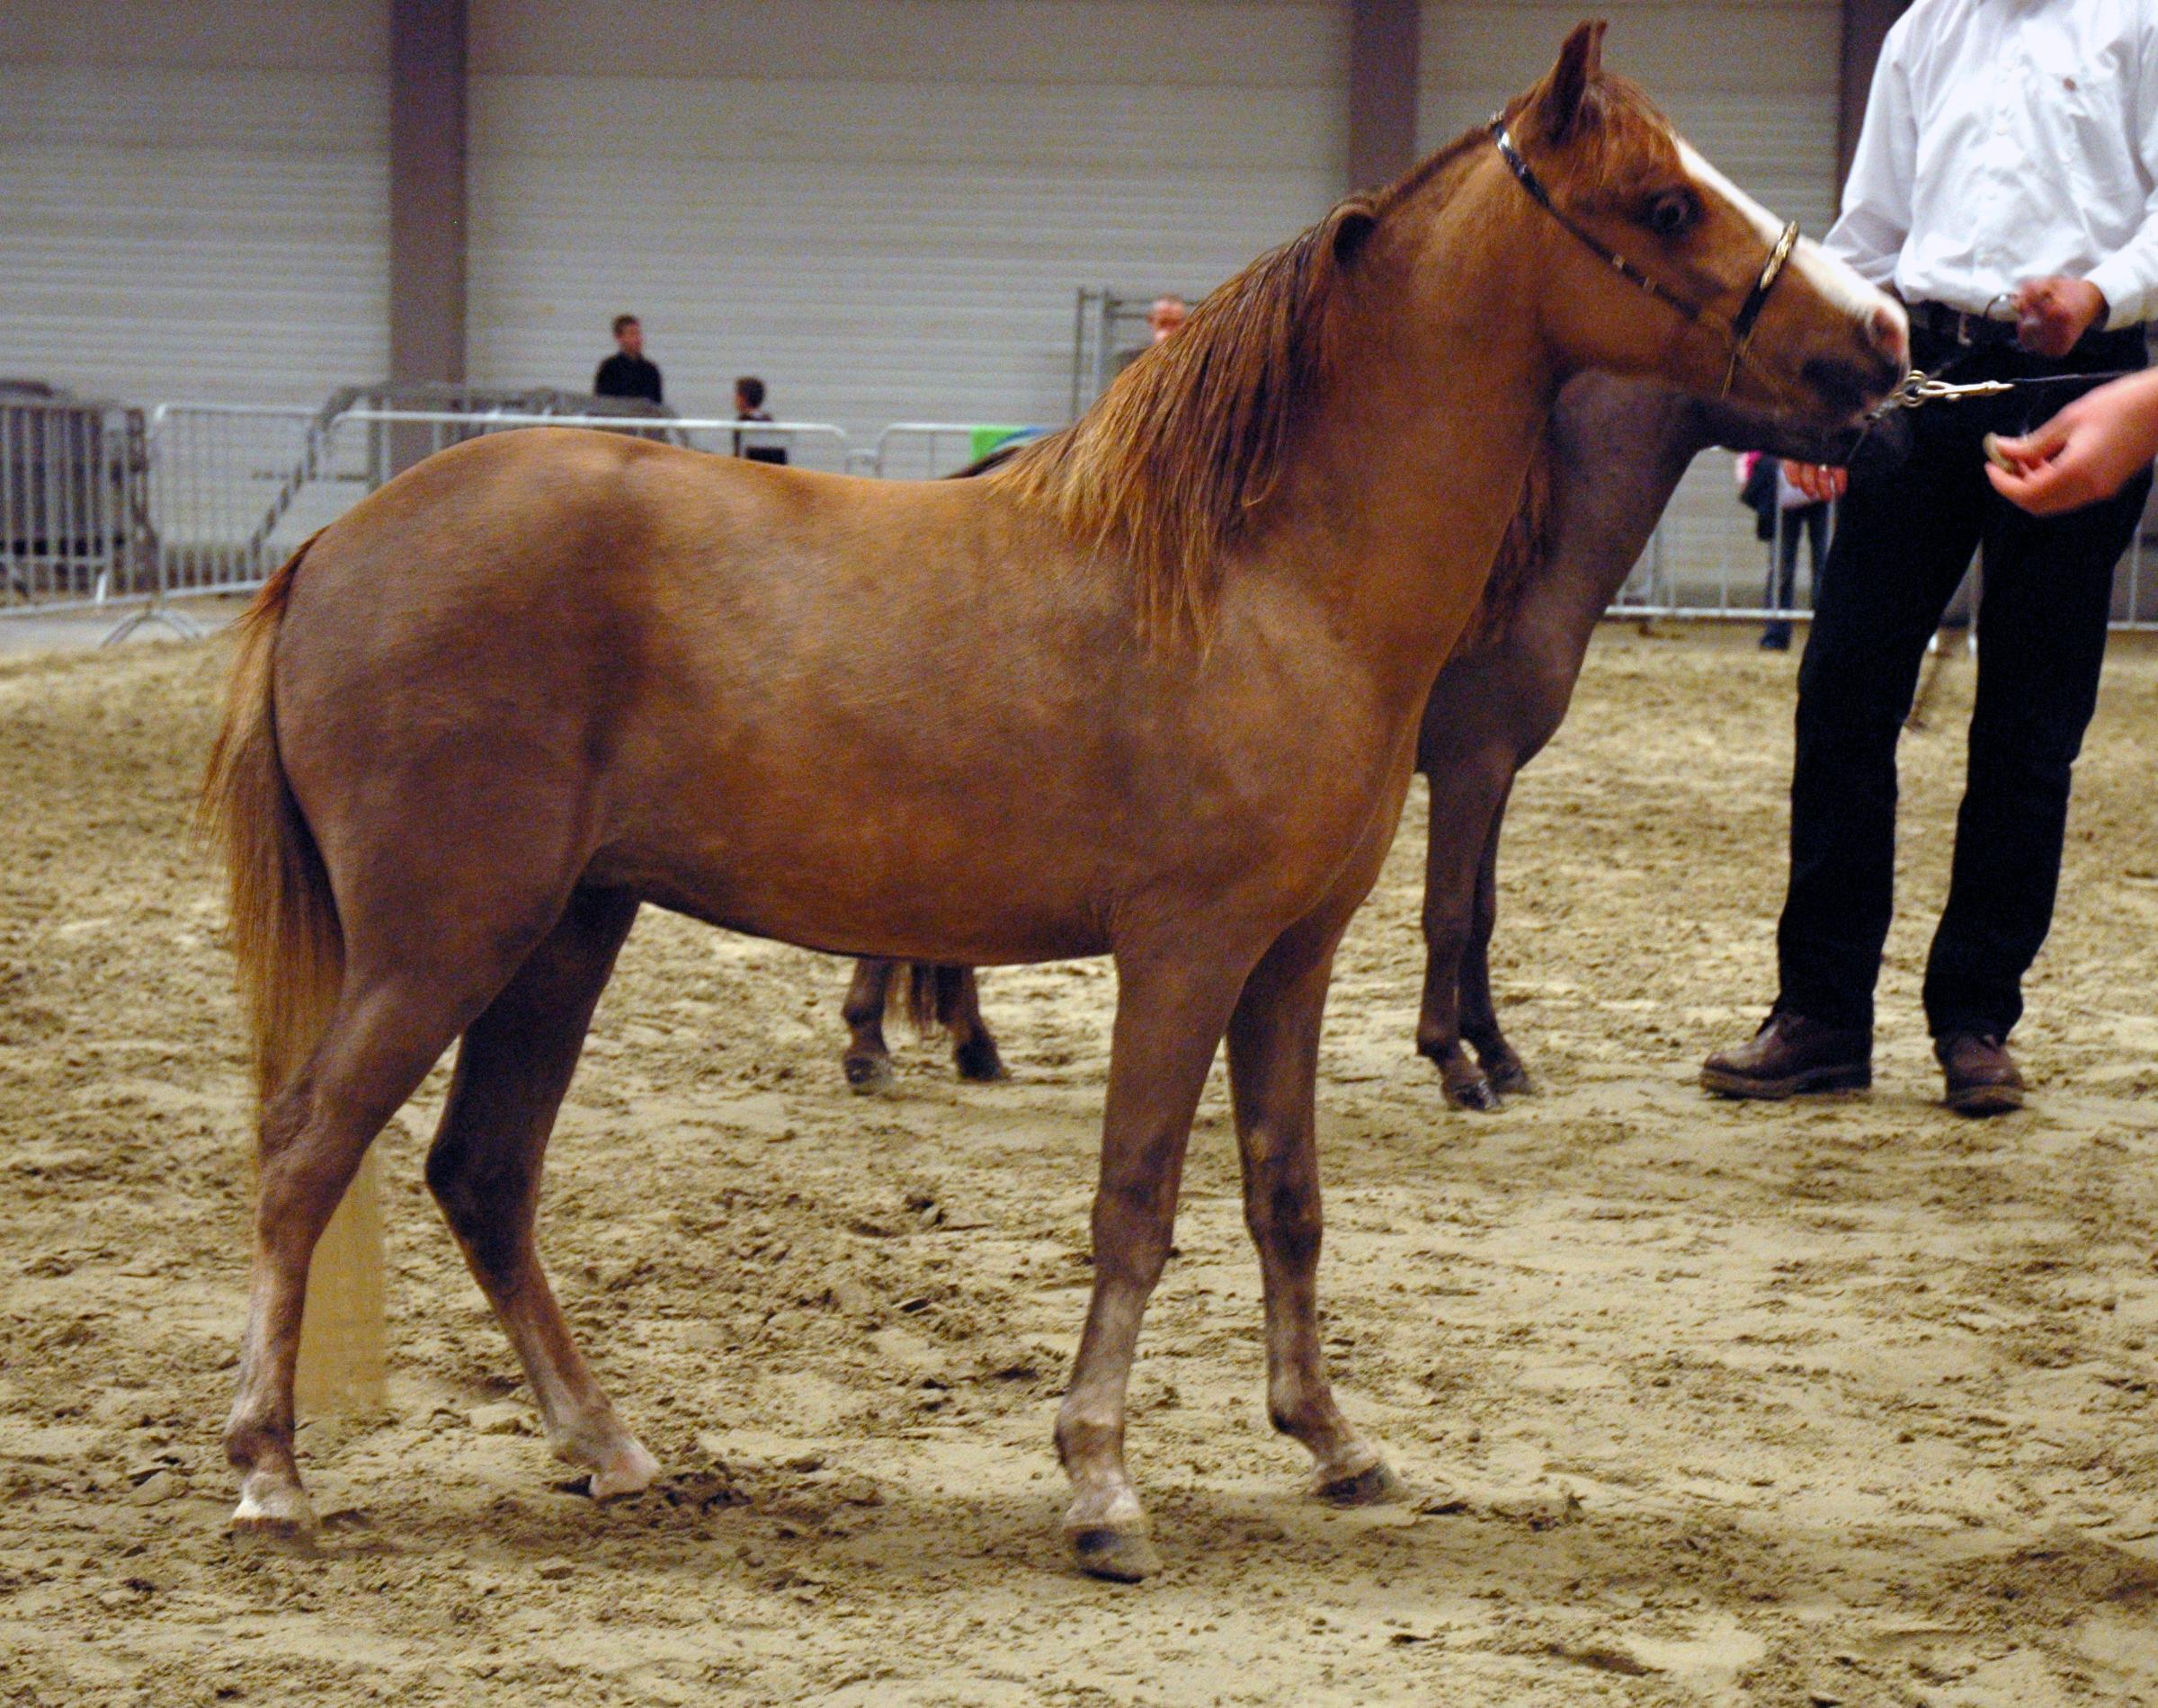 File:Miniature Horse Sideview Shot.jpg